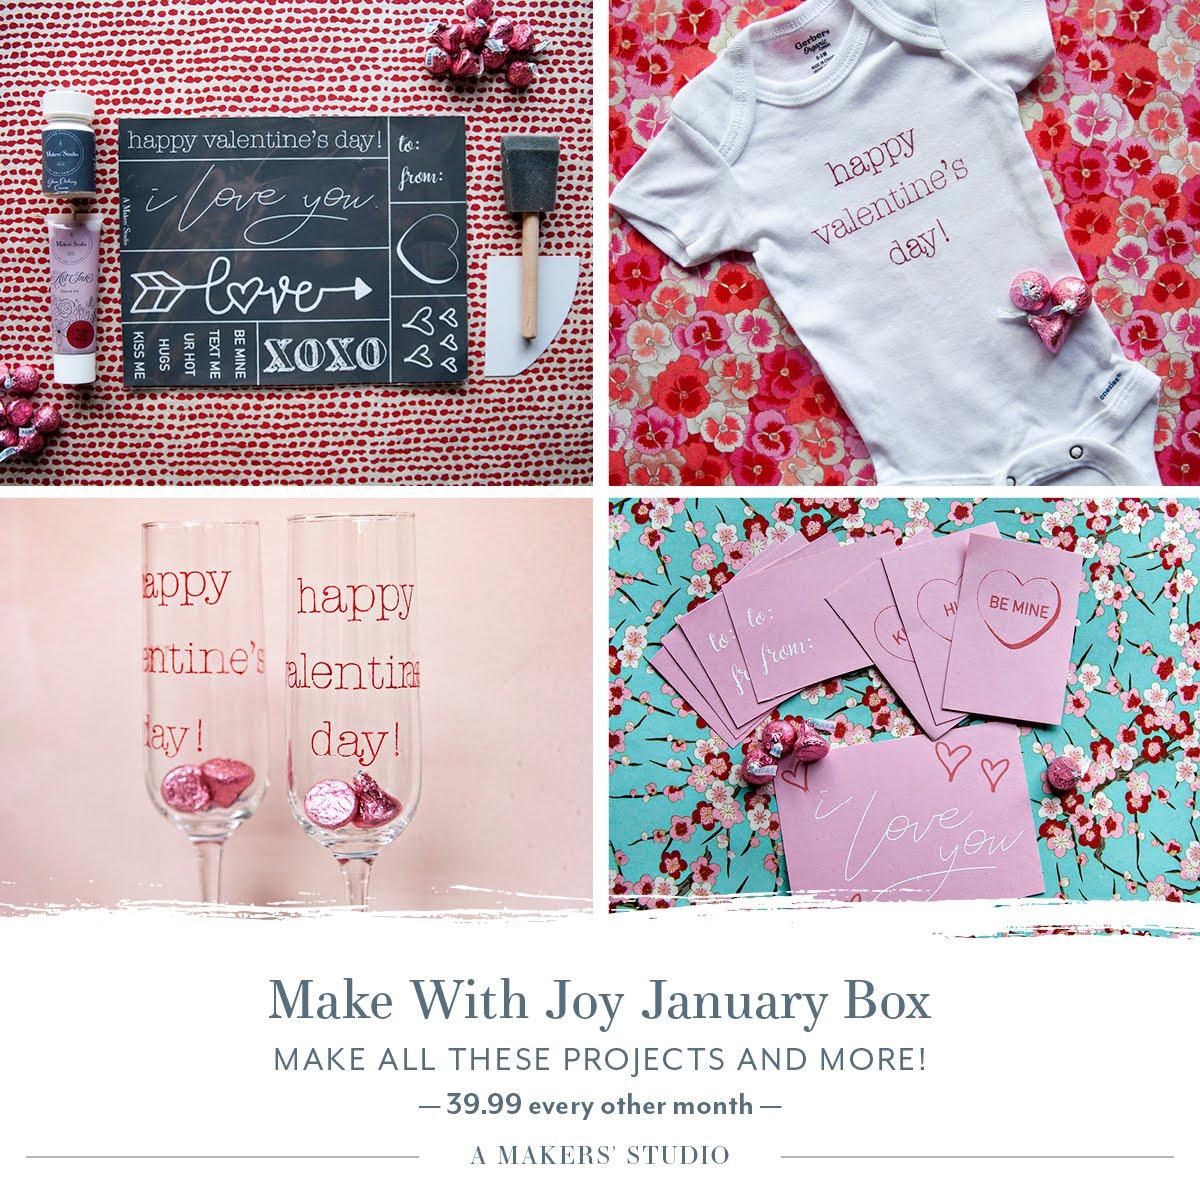 Make with Joy